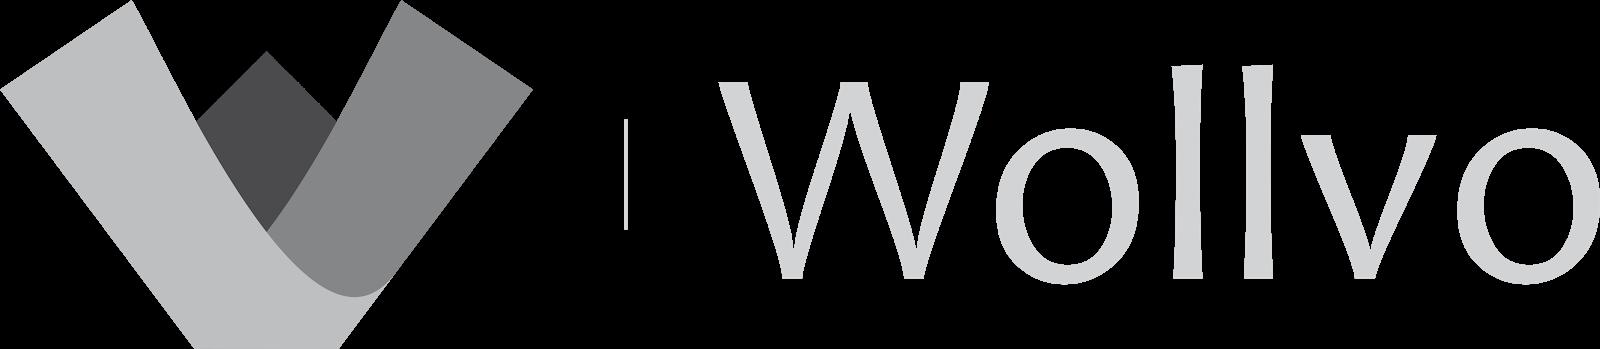 Wollvo